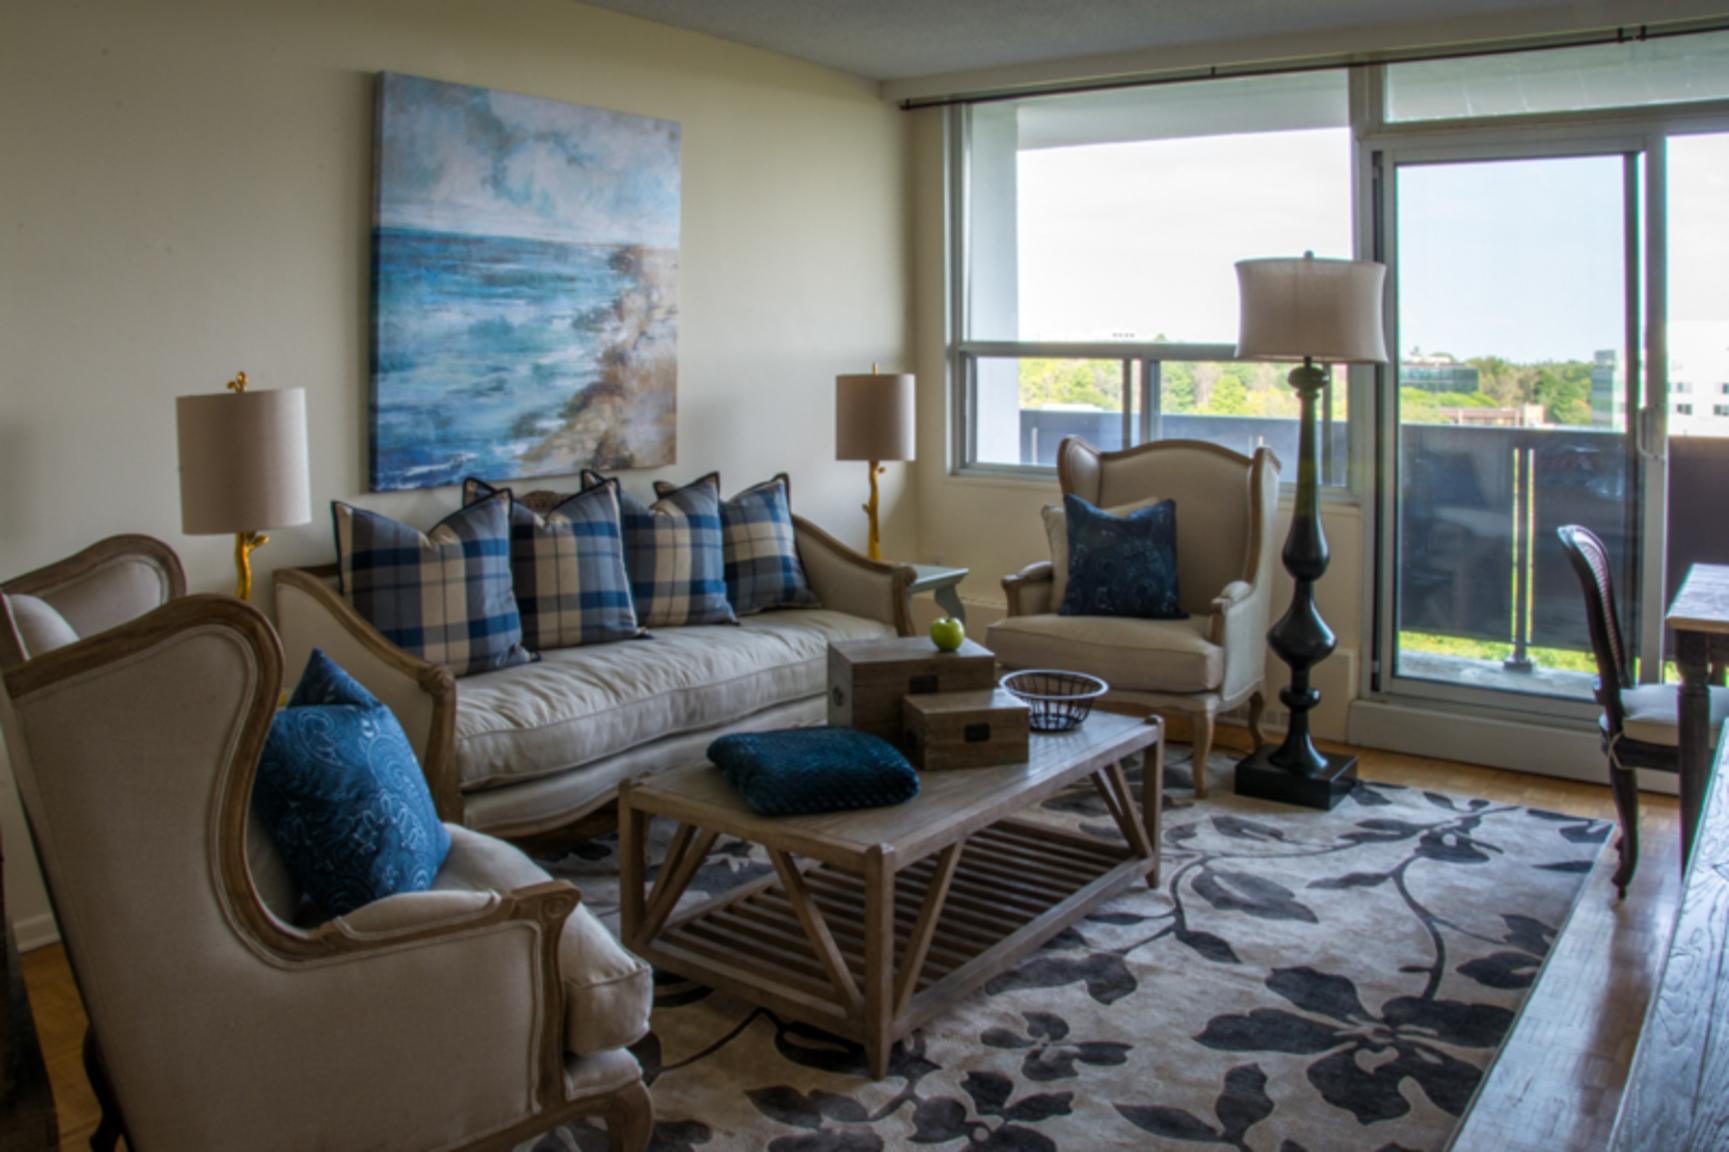 1 Room Apartment For Rent Ottawa